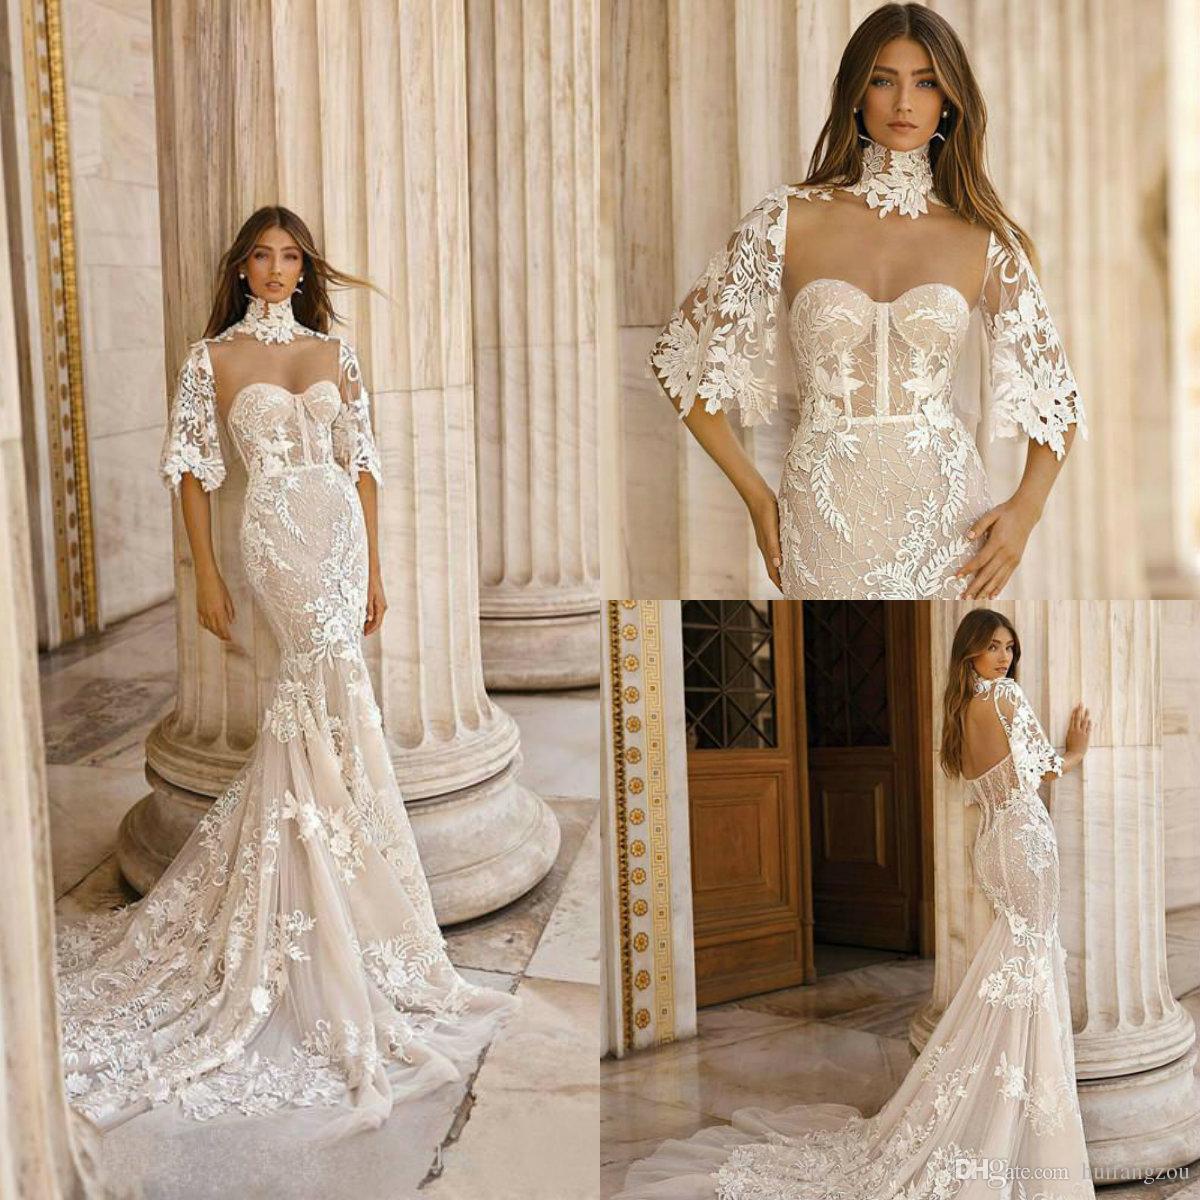 6e7b9cdd5bdd Berta 2019 Mermaid Wedding Dresses With Wrap Sweetheart Lace Vintage Wedding  Dress Vestidos De Noiva Custom Made Beach Bridal Gowns Shop Wedding Dress  ...